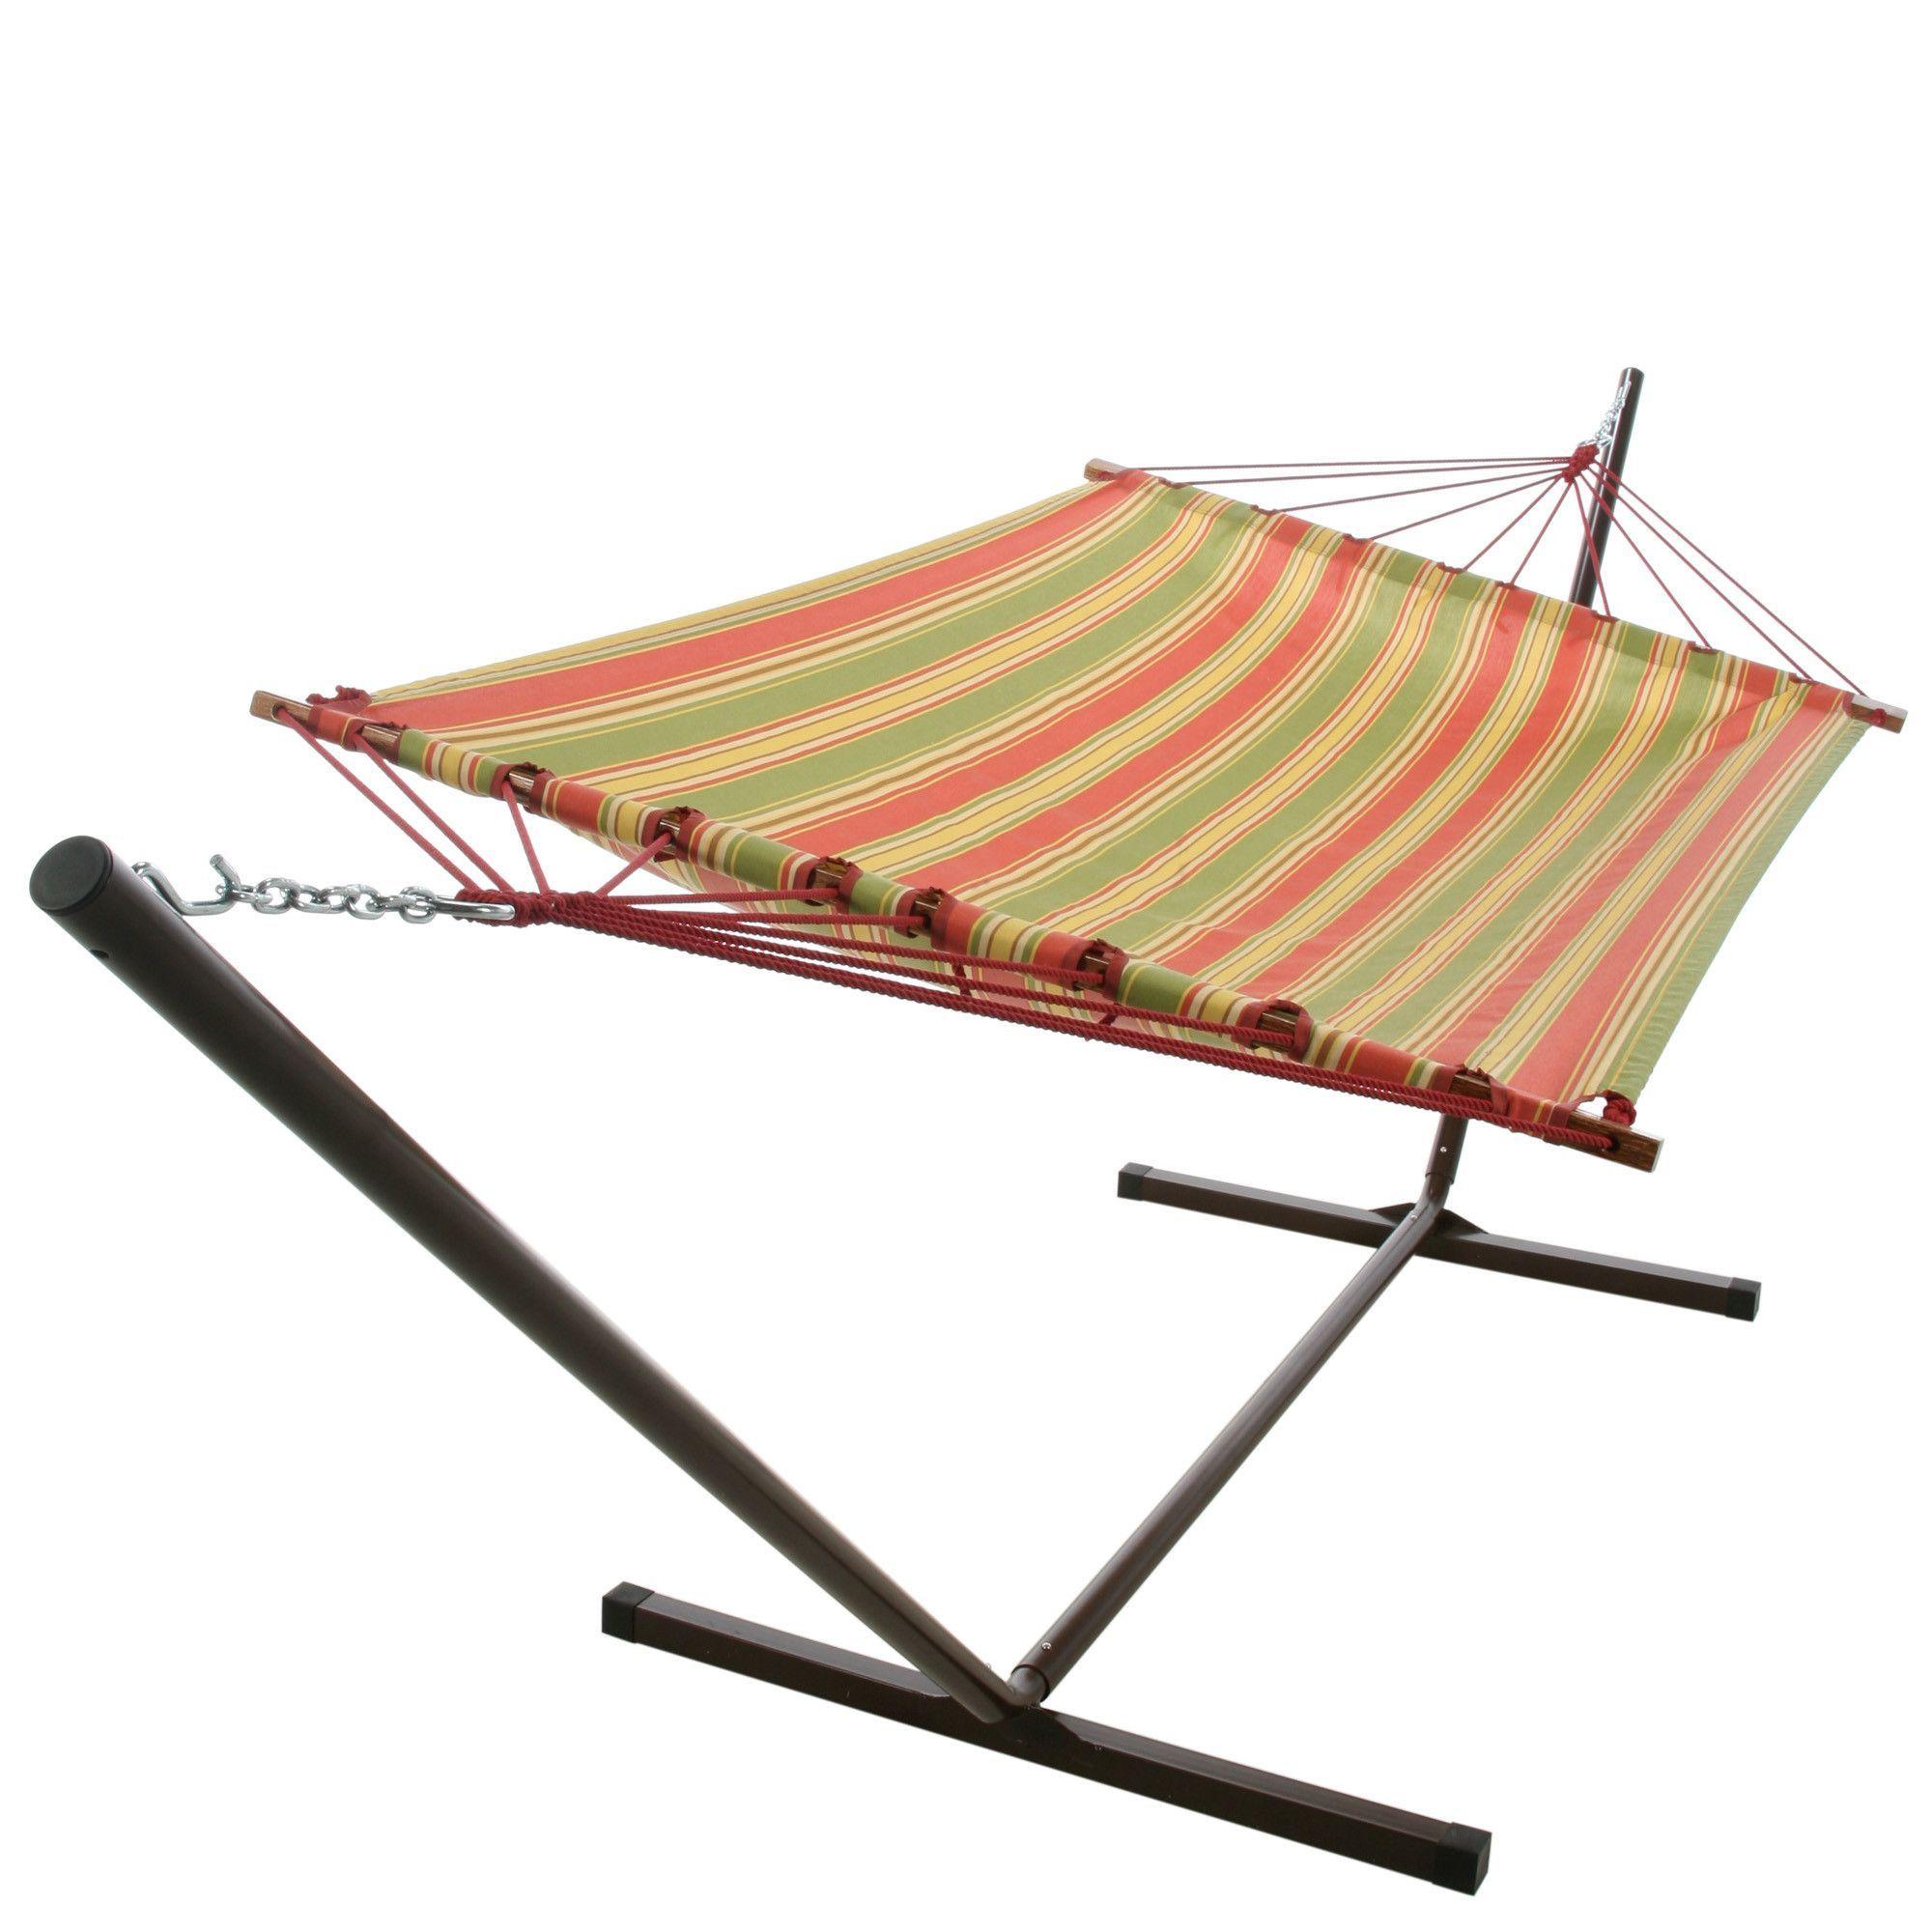 Tribeam steel hammock stand products pinterest hammock stand